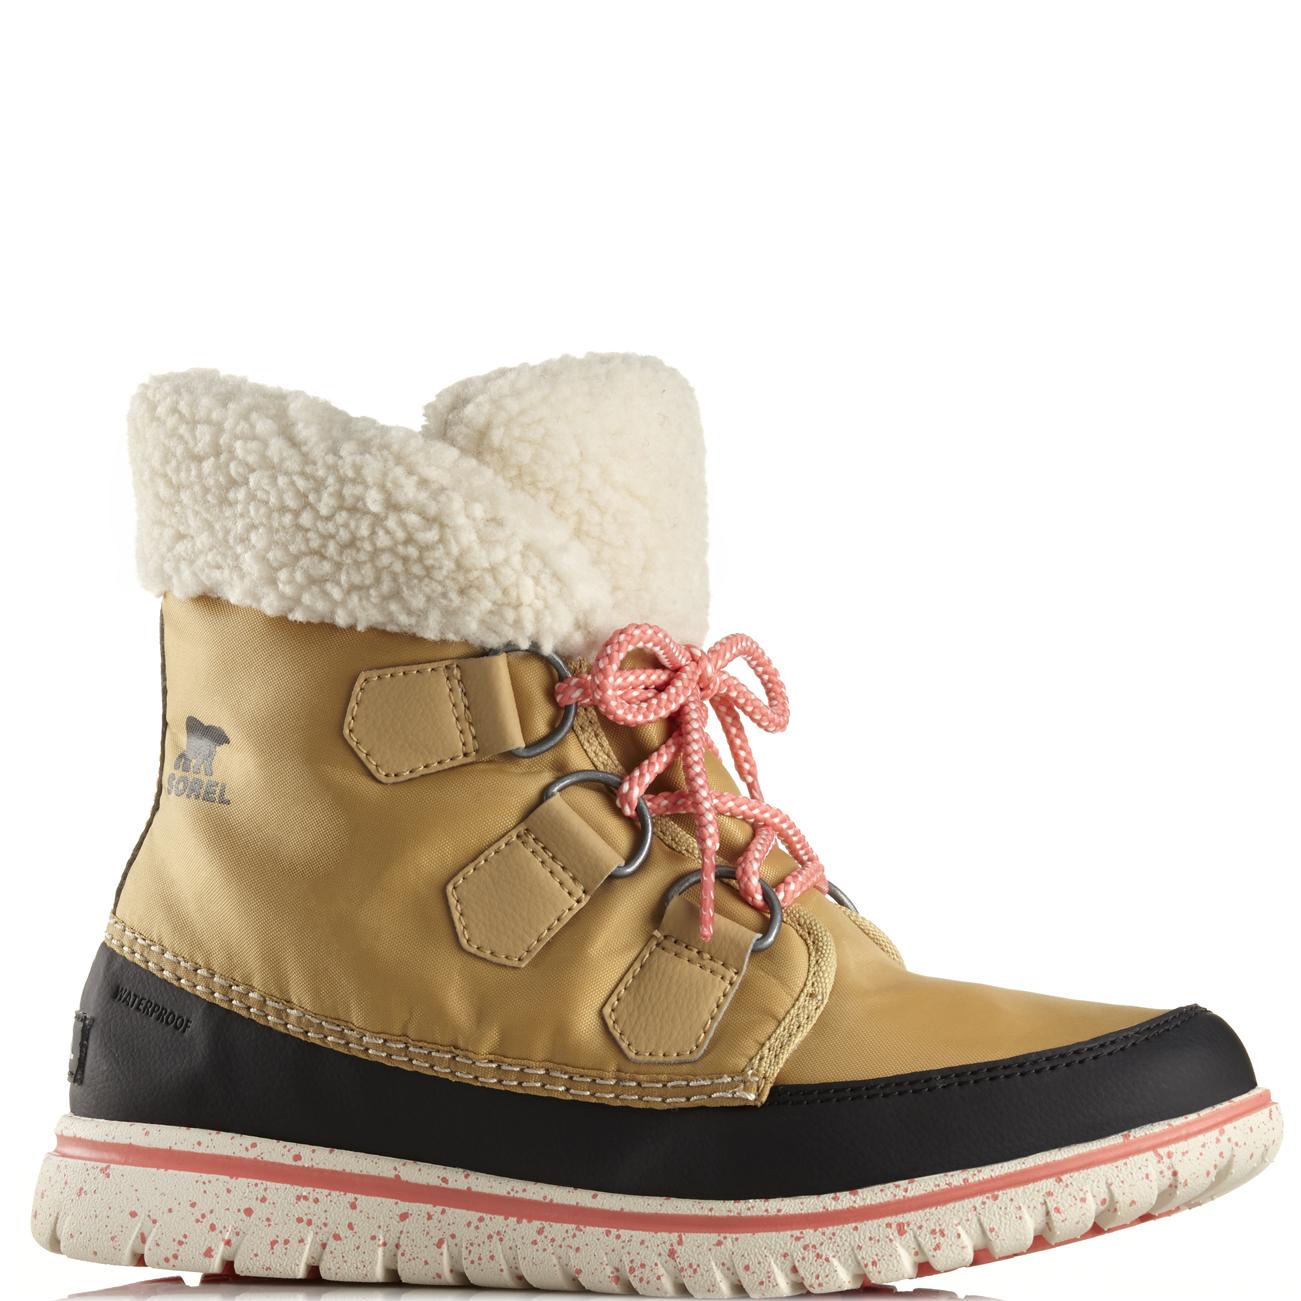 Sorel Carnival Boots Uk